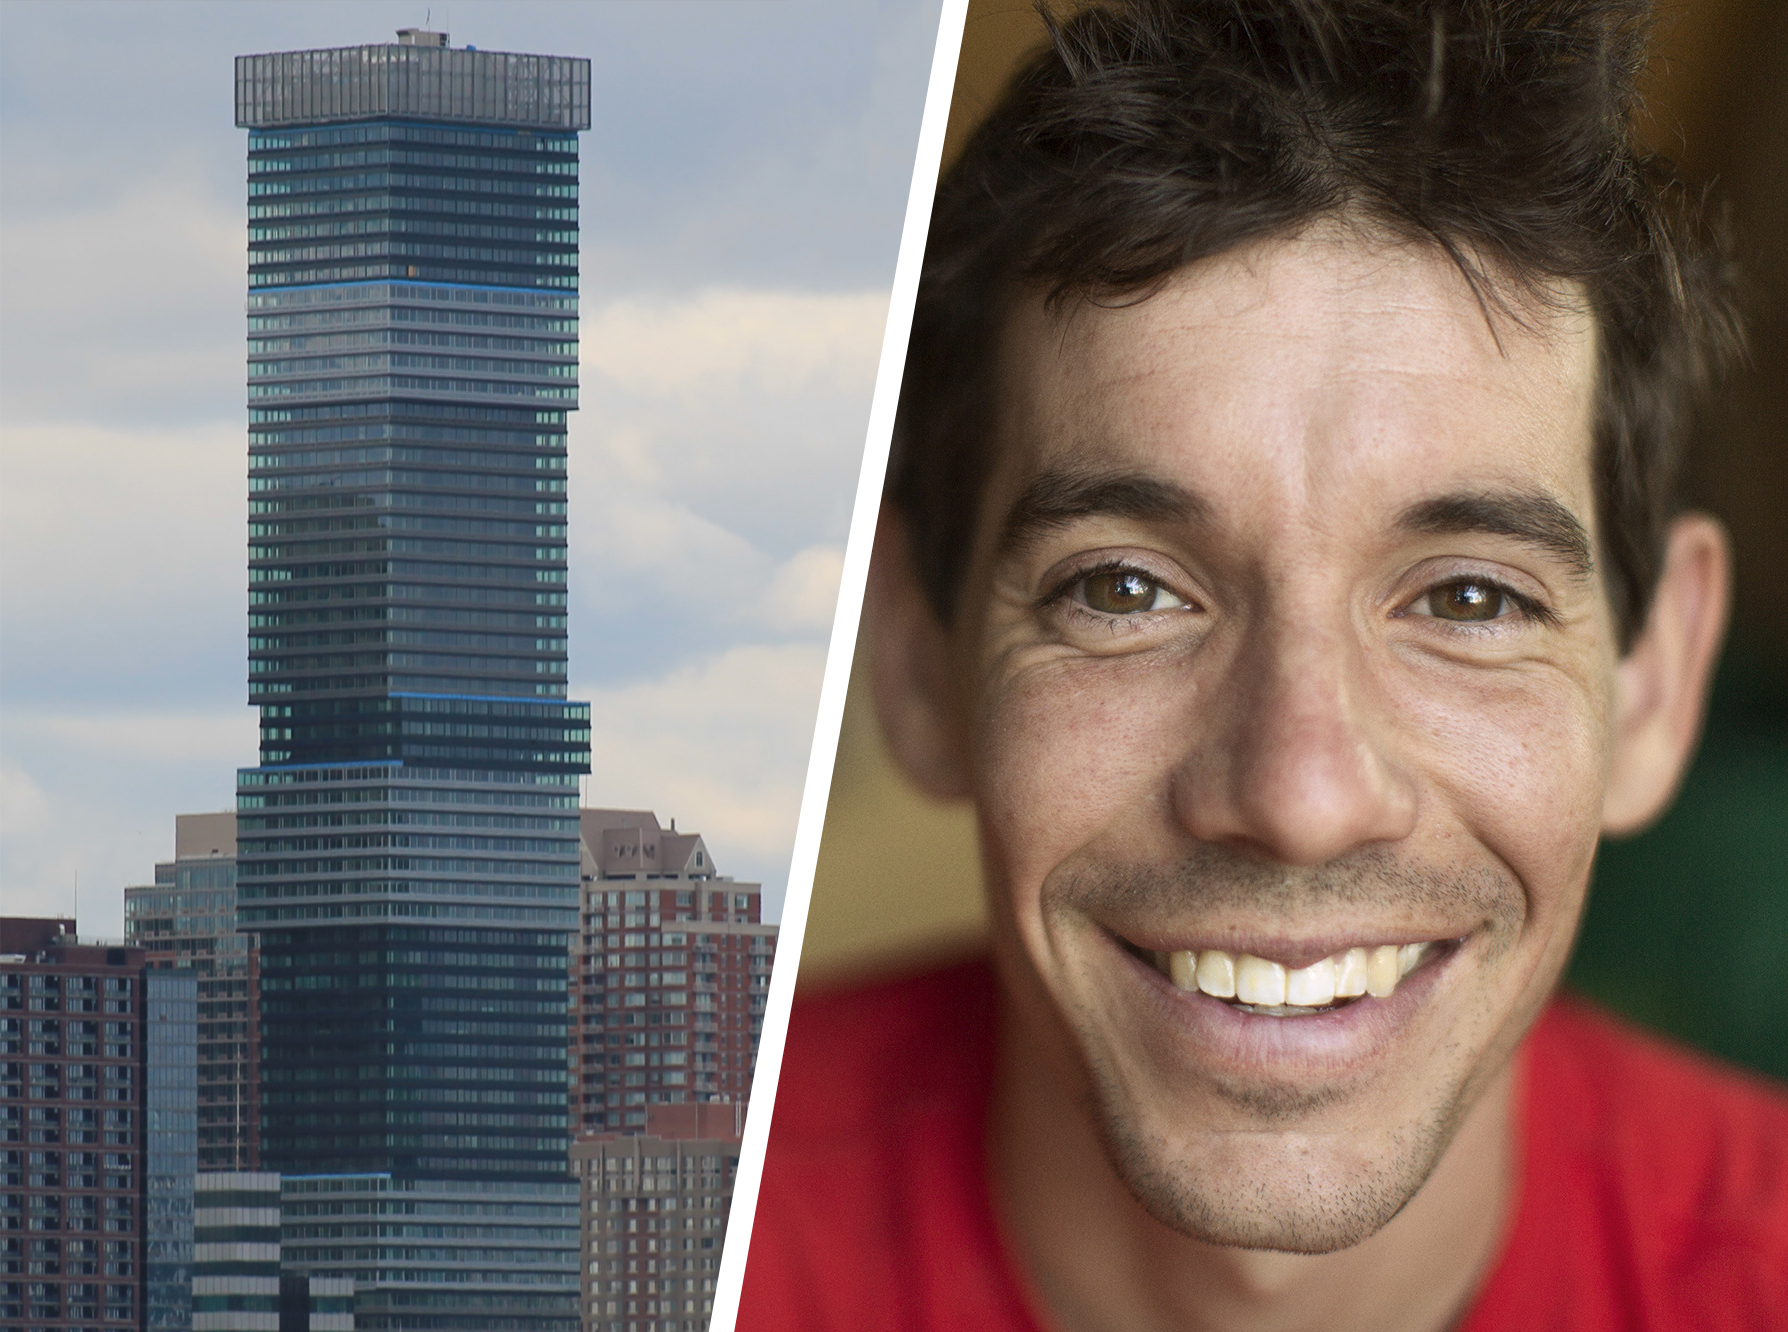 Alex Honnold free solos Urby skyscraper in Jersey City